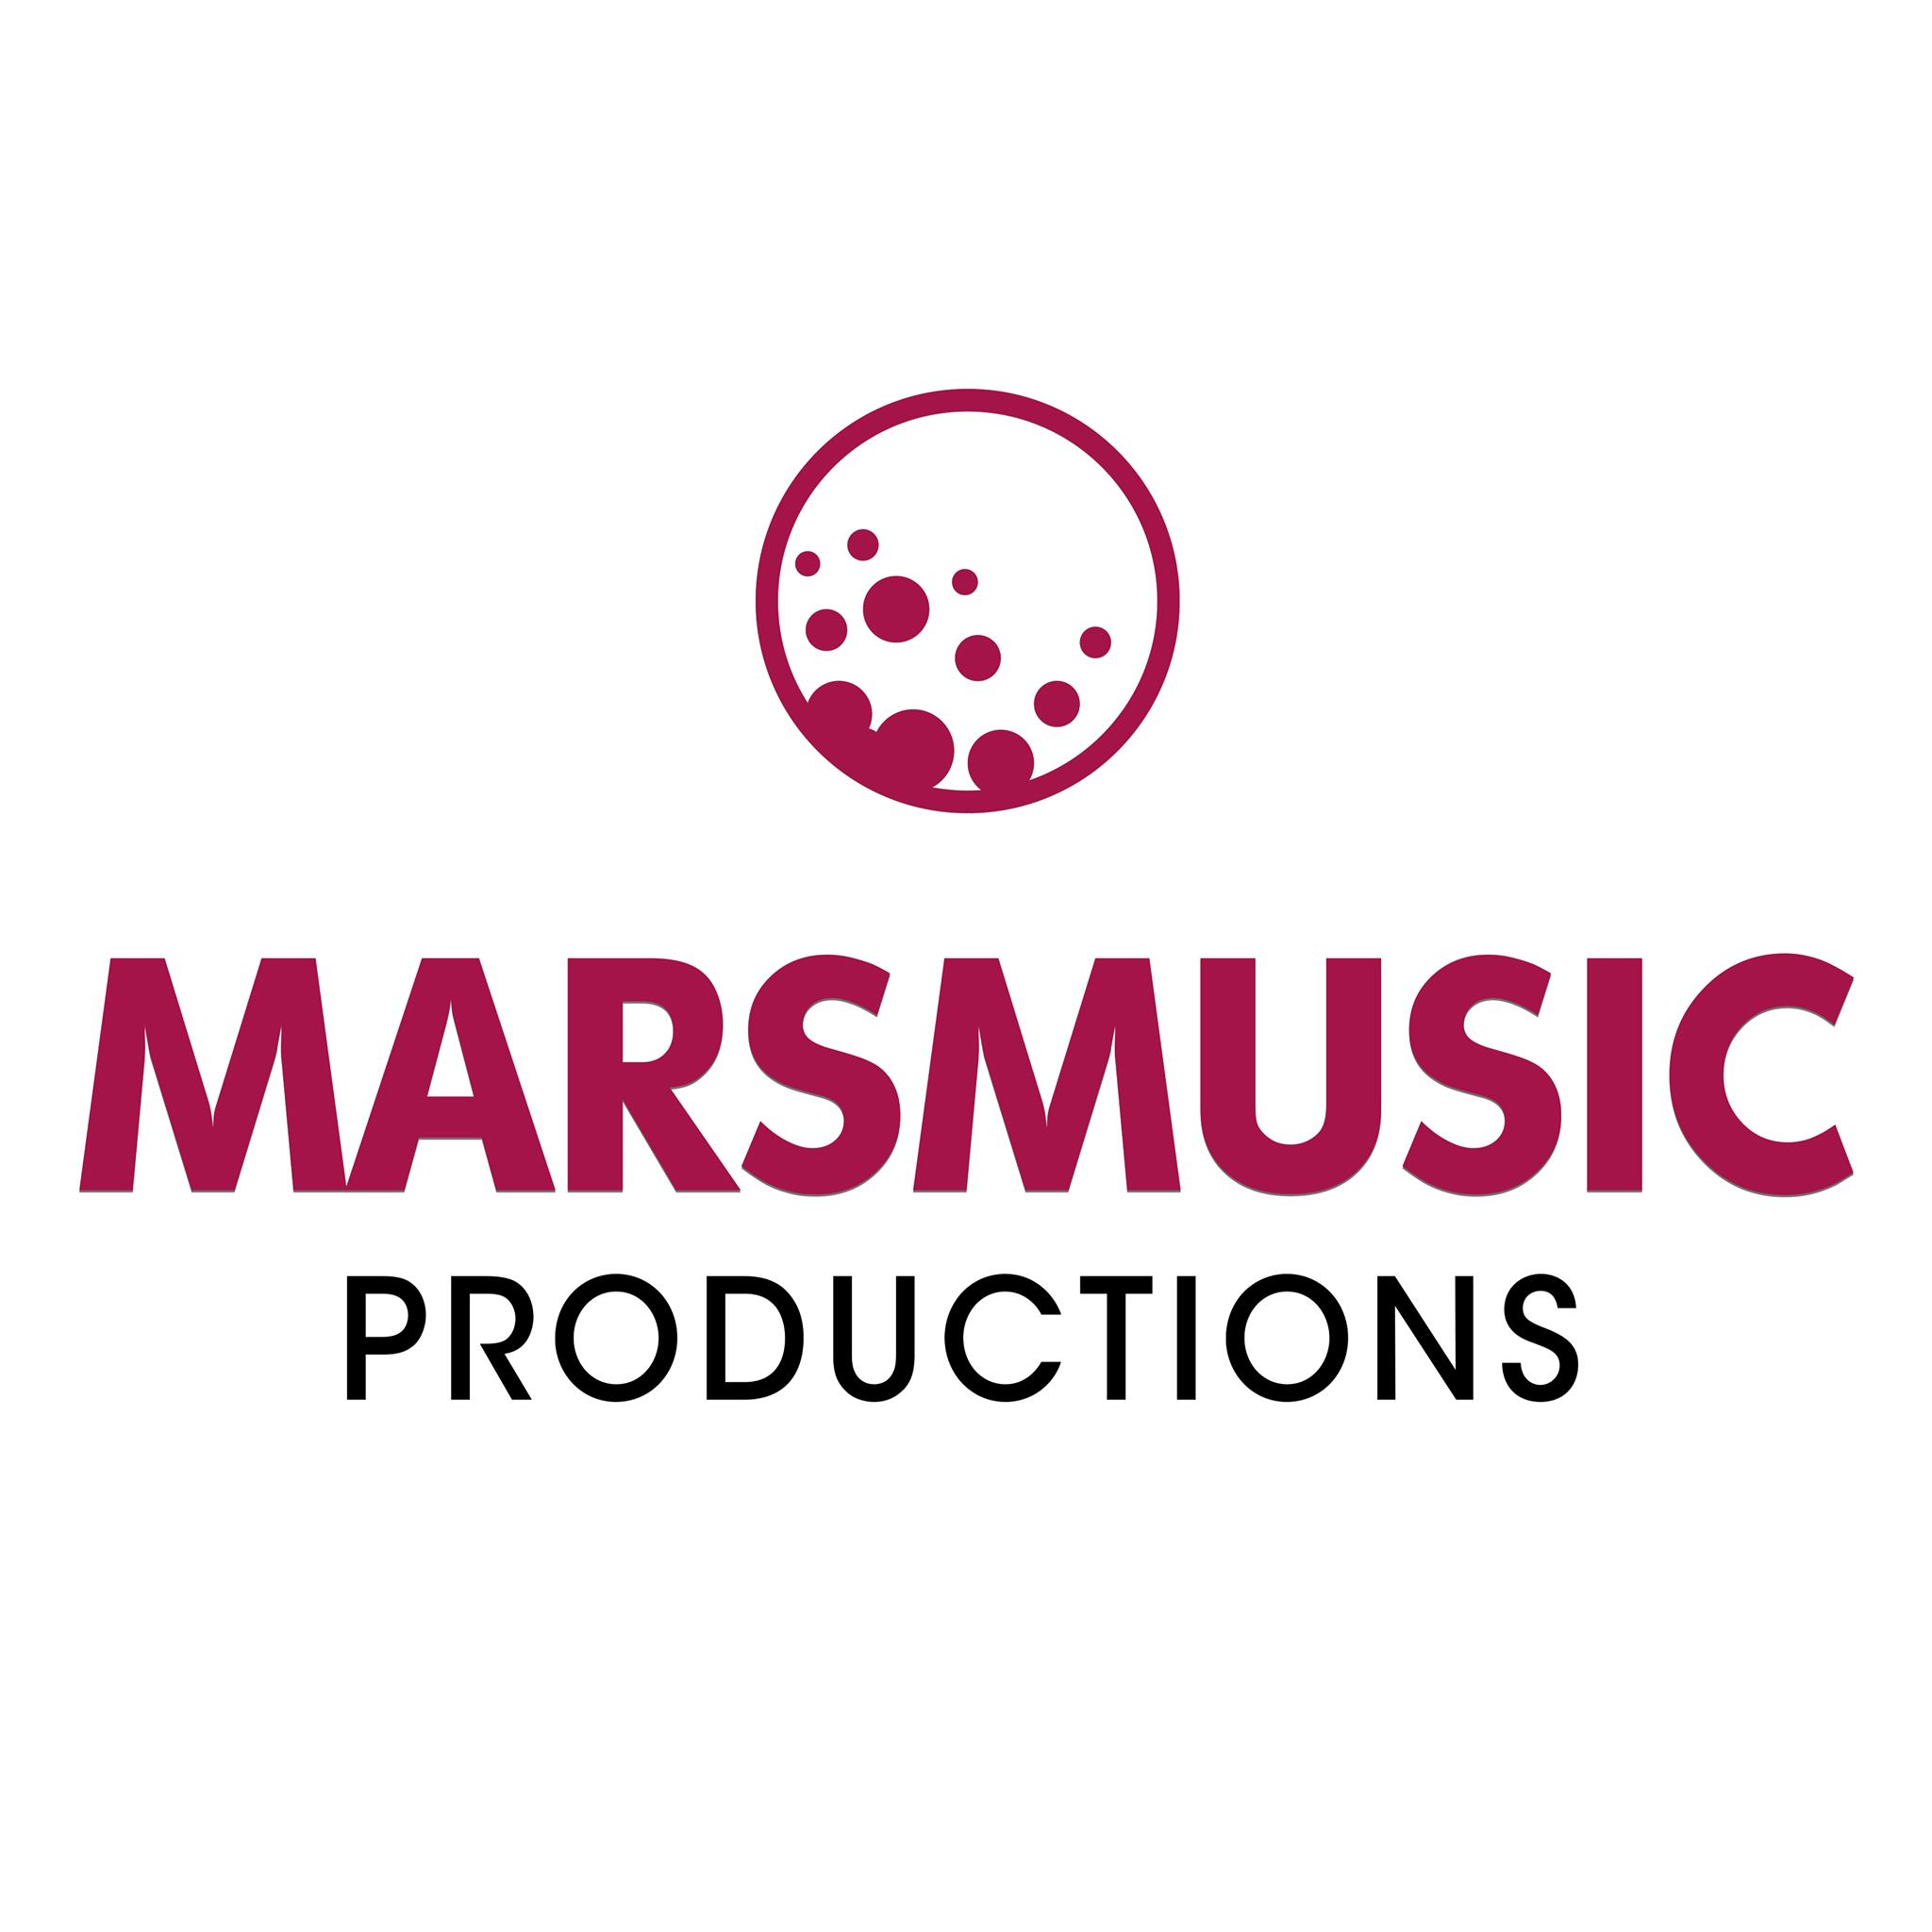 MarsMusic